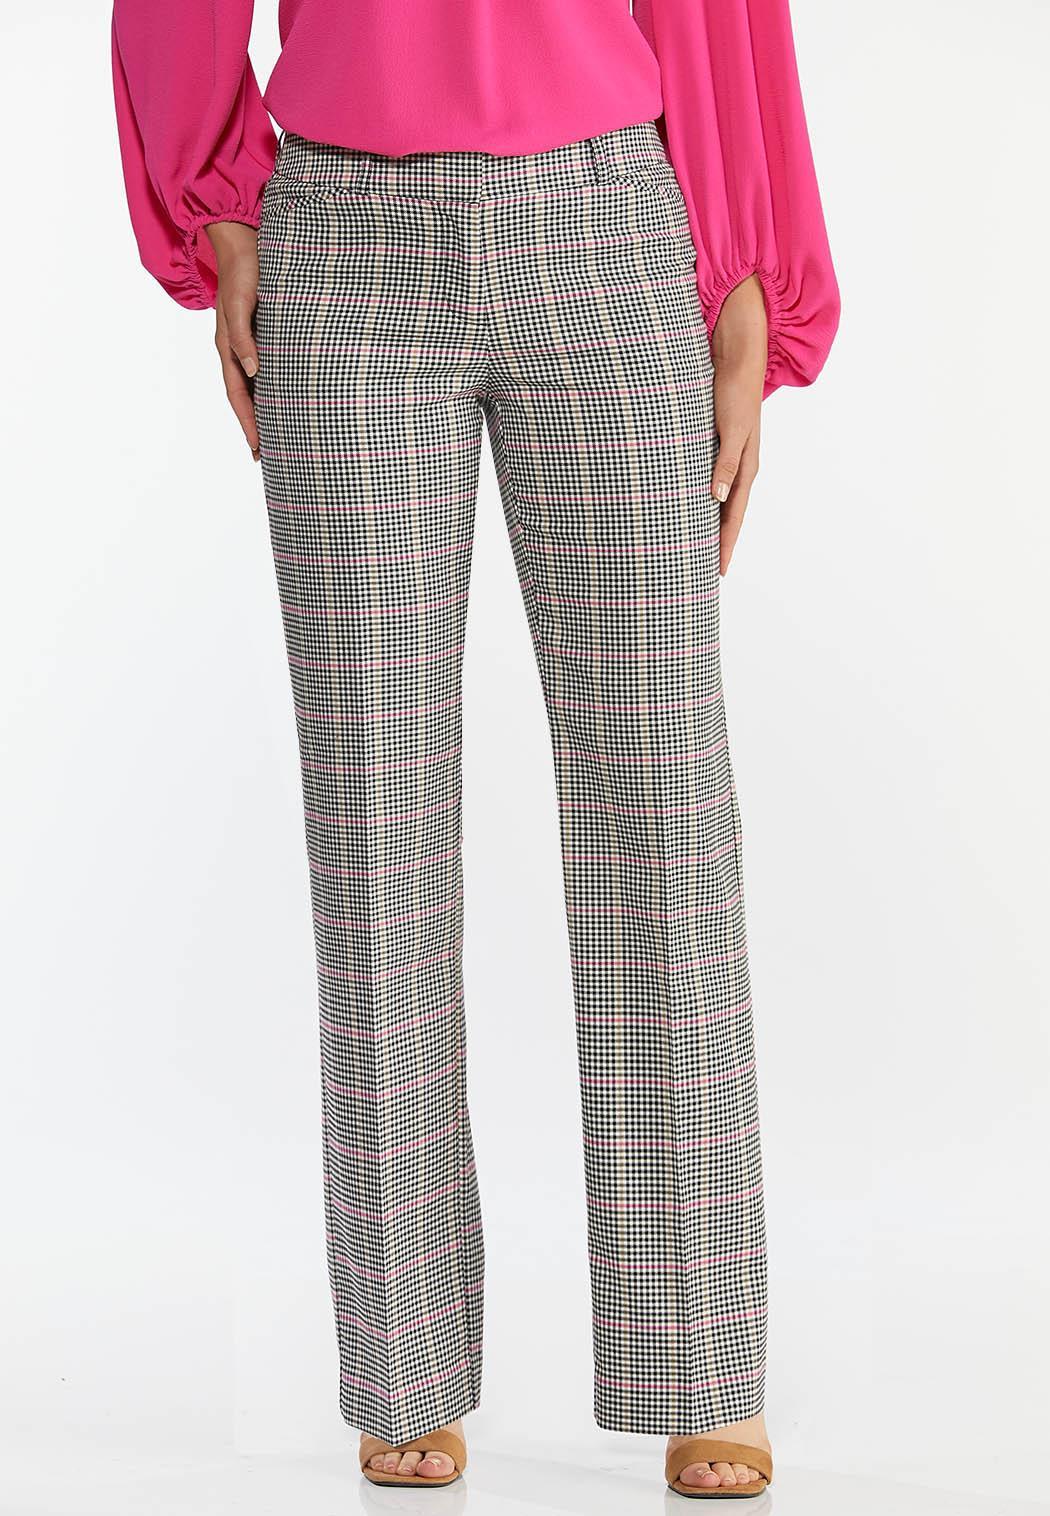 Pink Plaid Trouser Pants